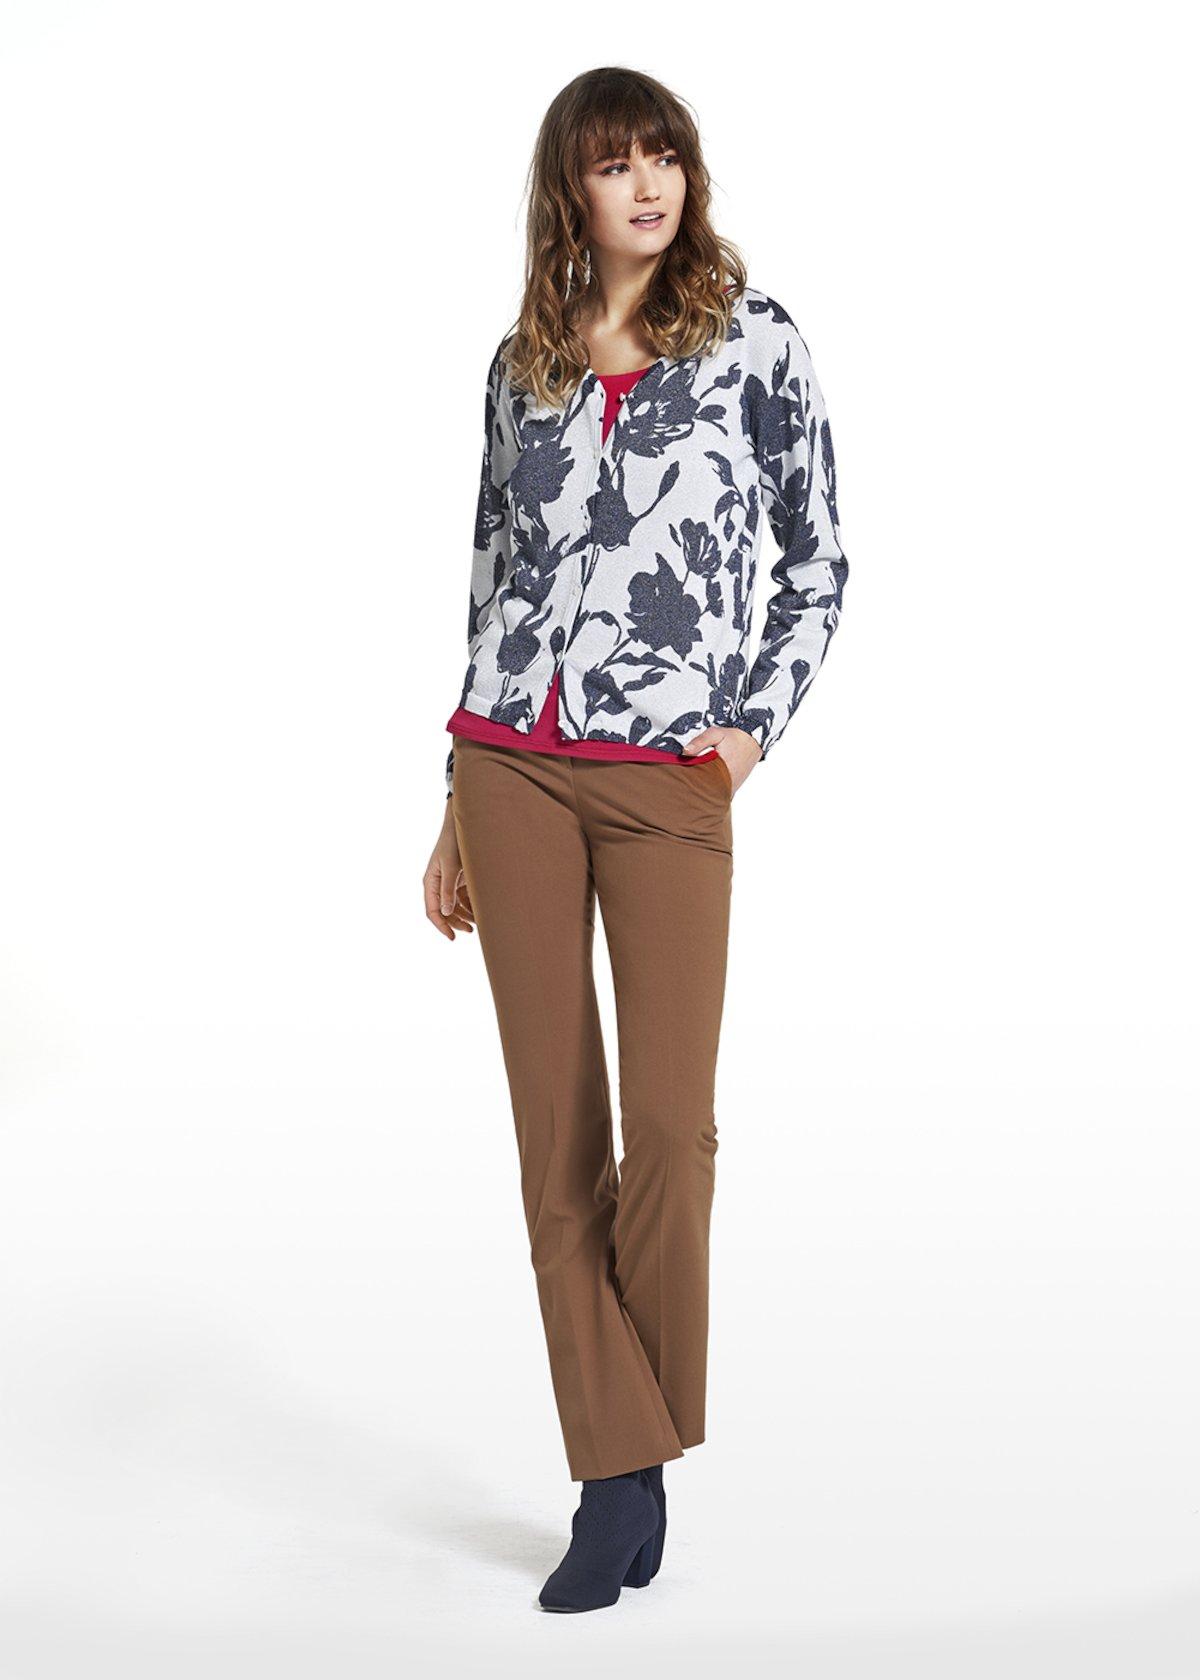 Cardigan Carly in maglia flowers fantasy - White Fantasia - Donna - Immagine categoria